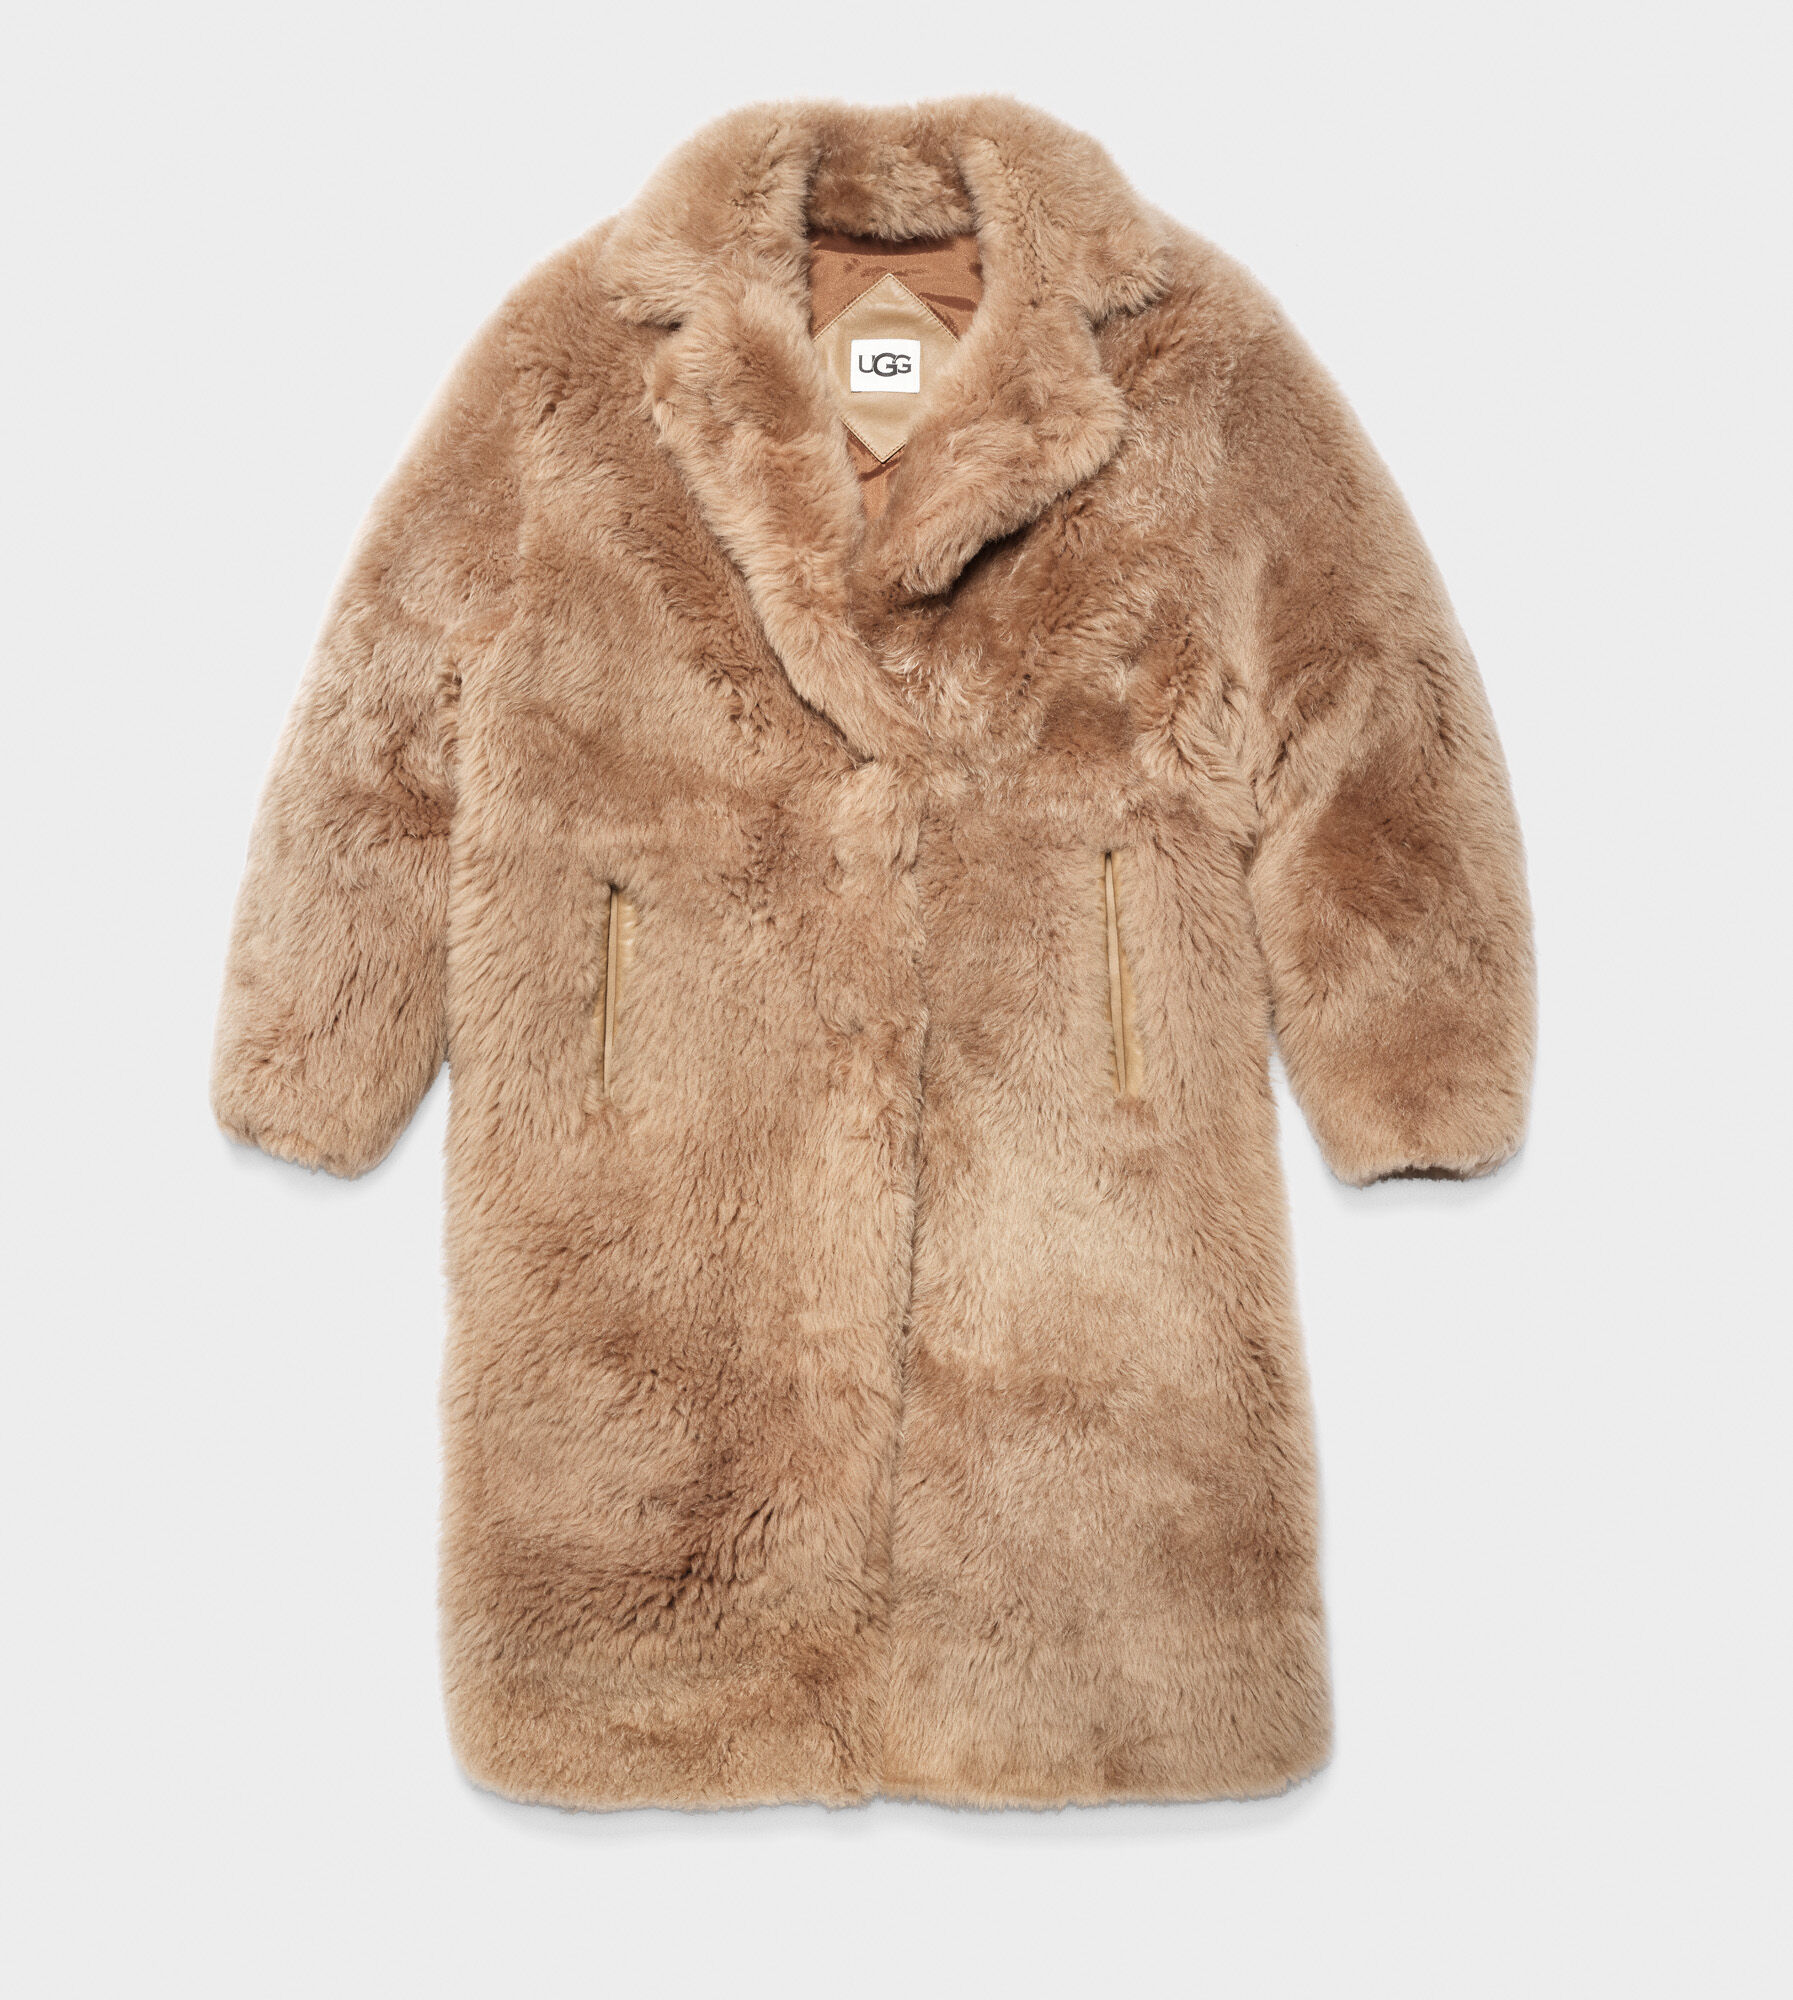 Esme Long Shearling Coat - Ugg (US)